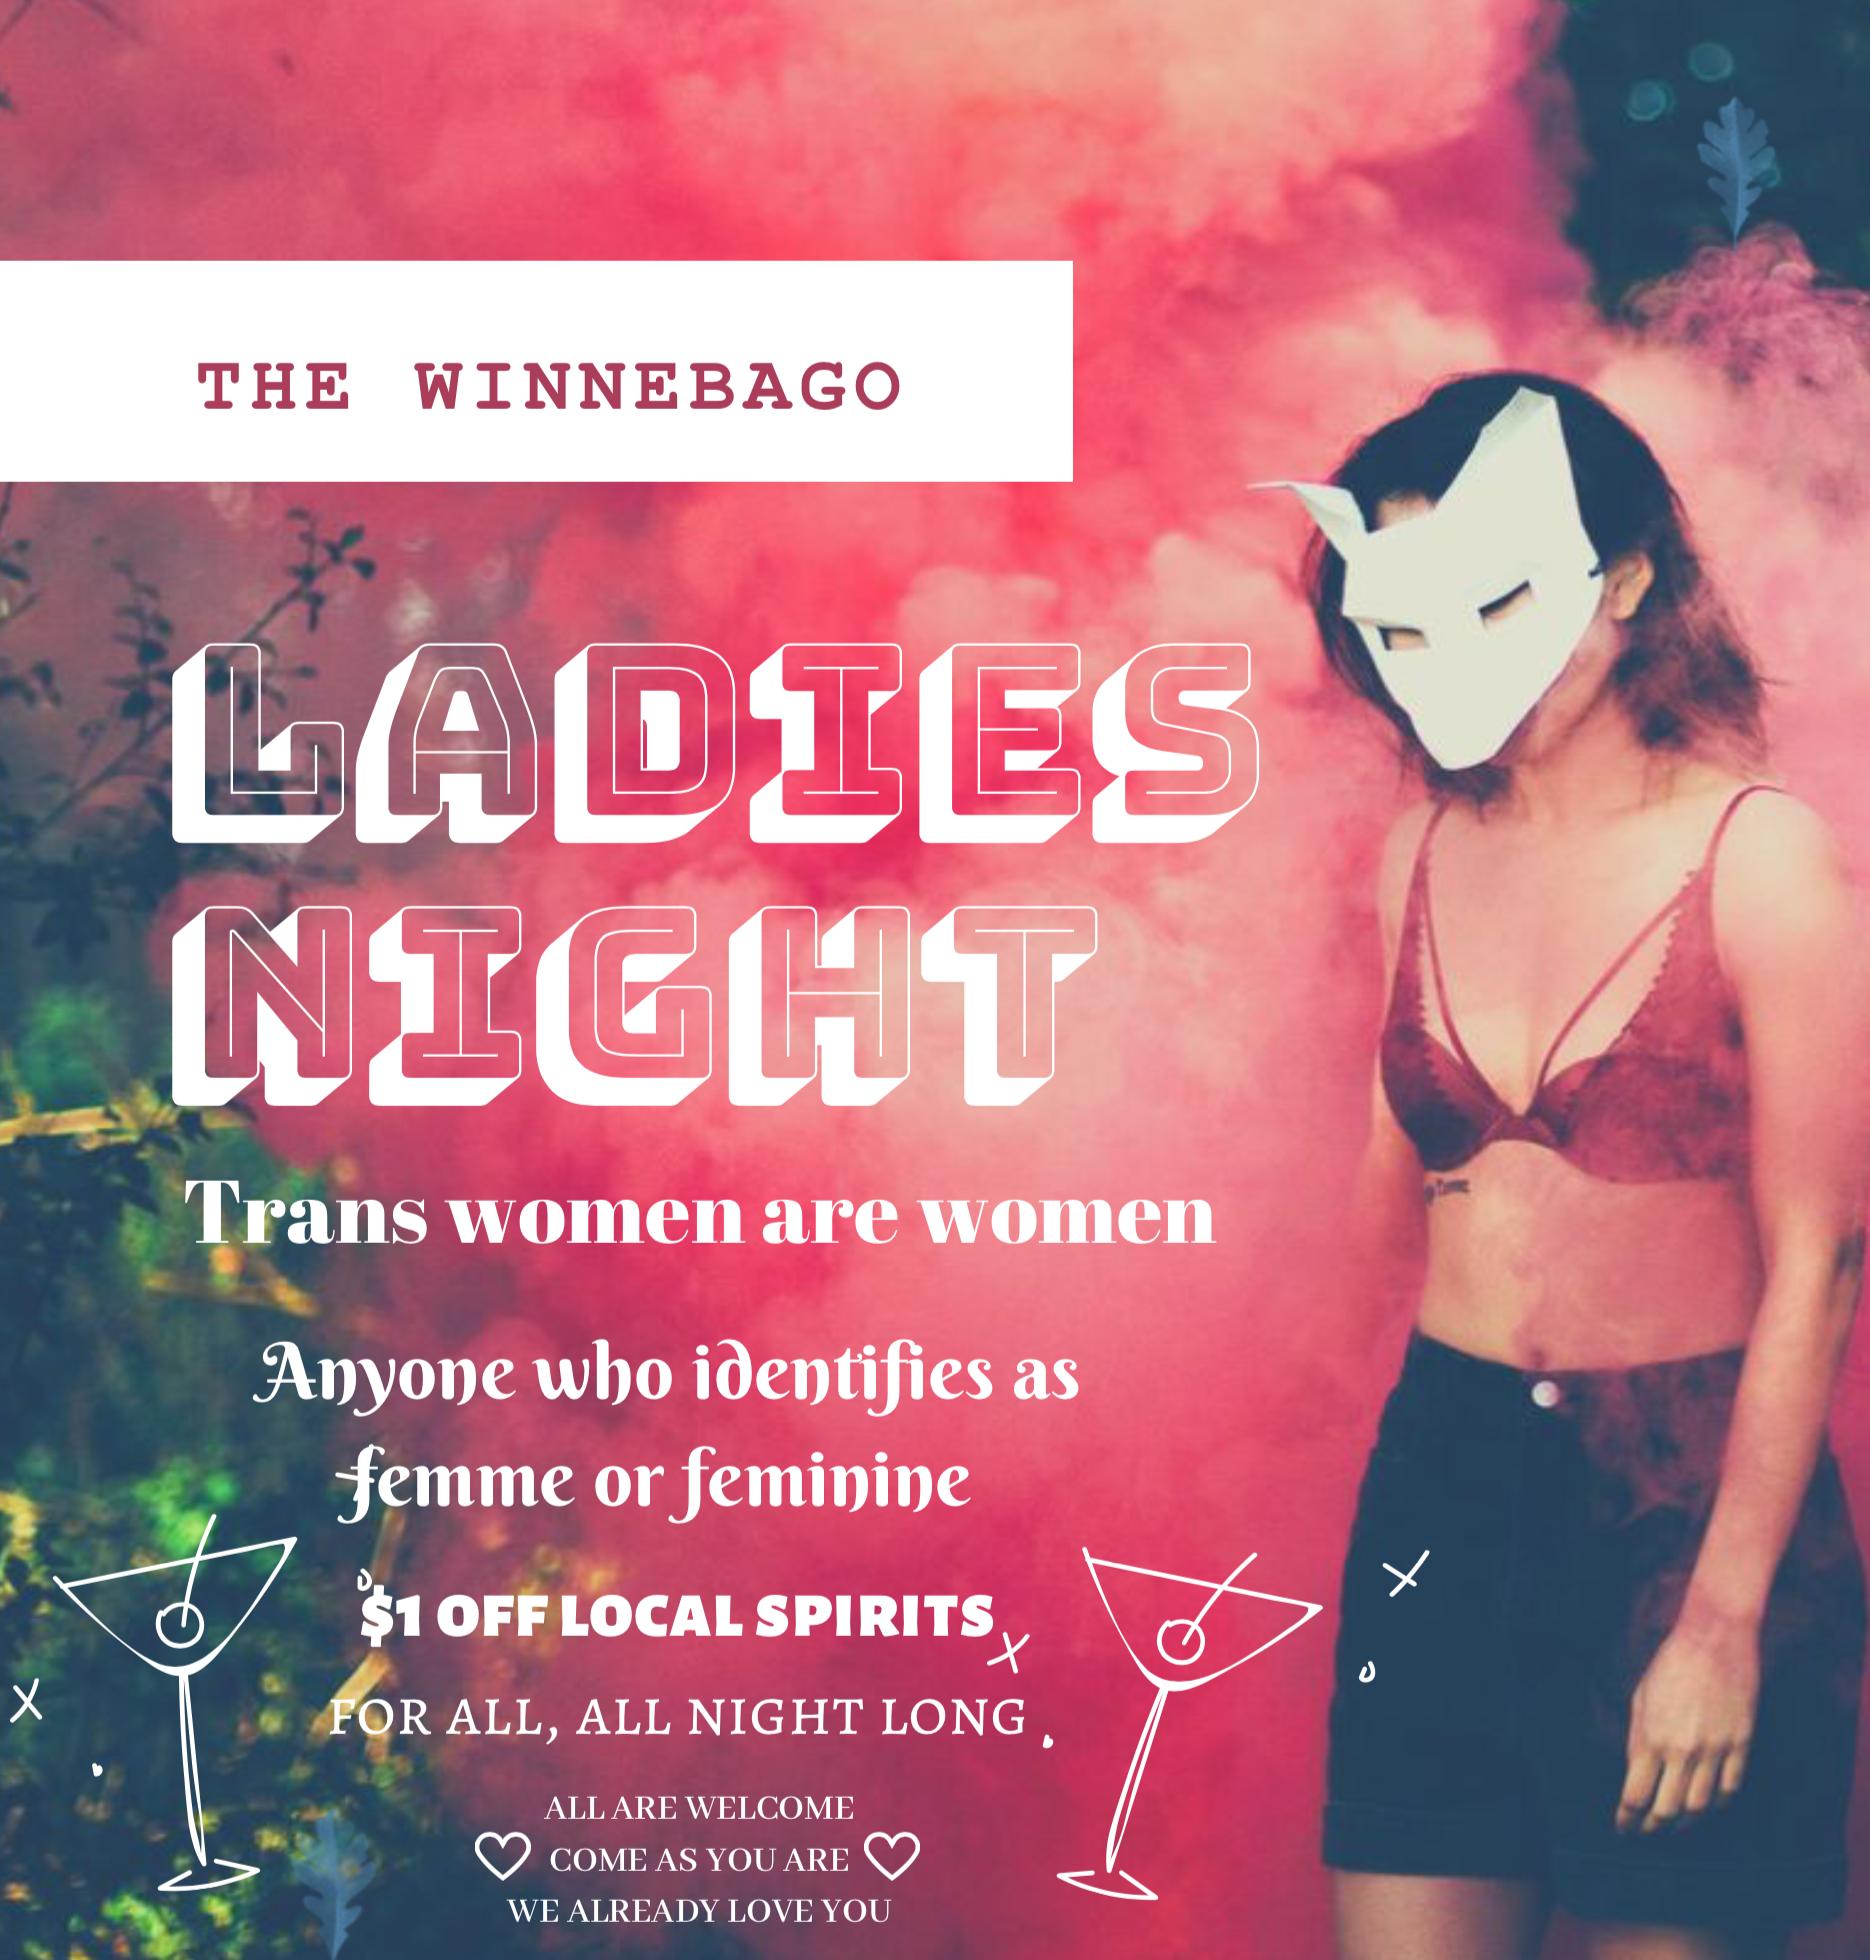 ladies-night-the-winnebago-madison-wisconsin.png